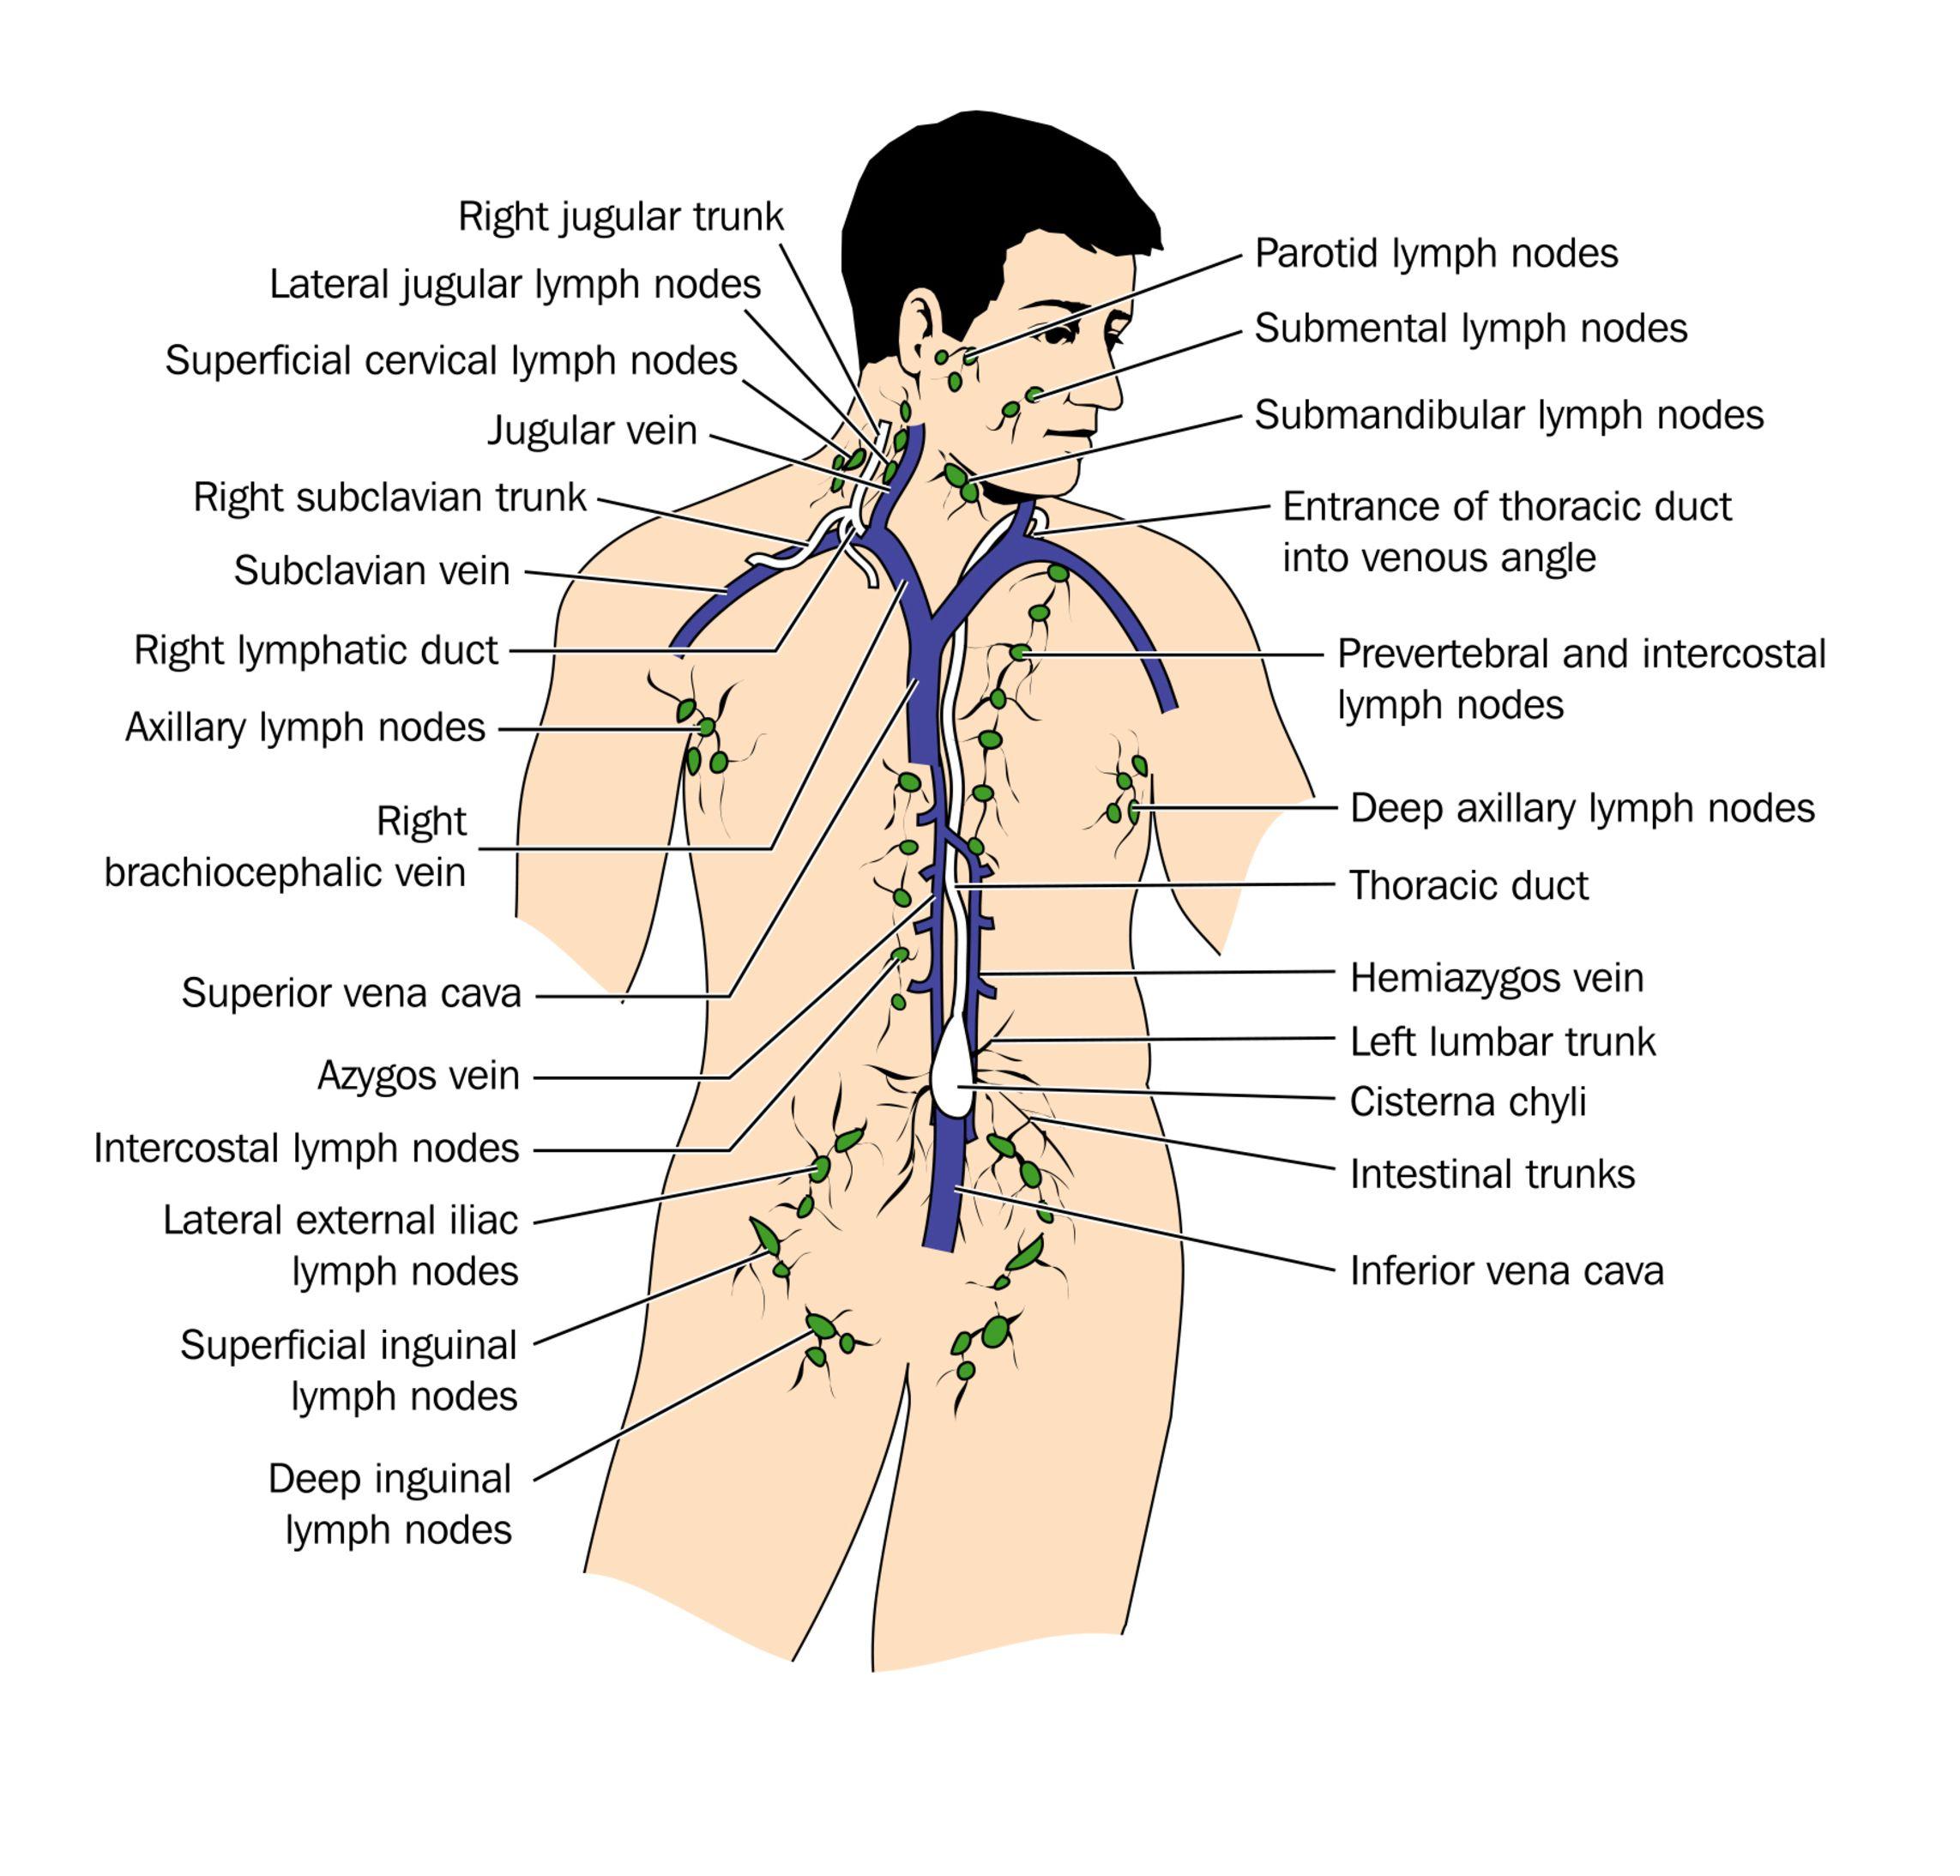 Emberi papillomavírus nőkben